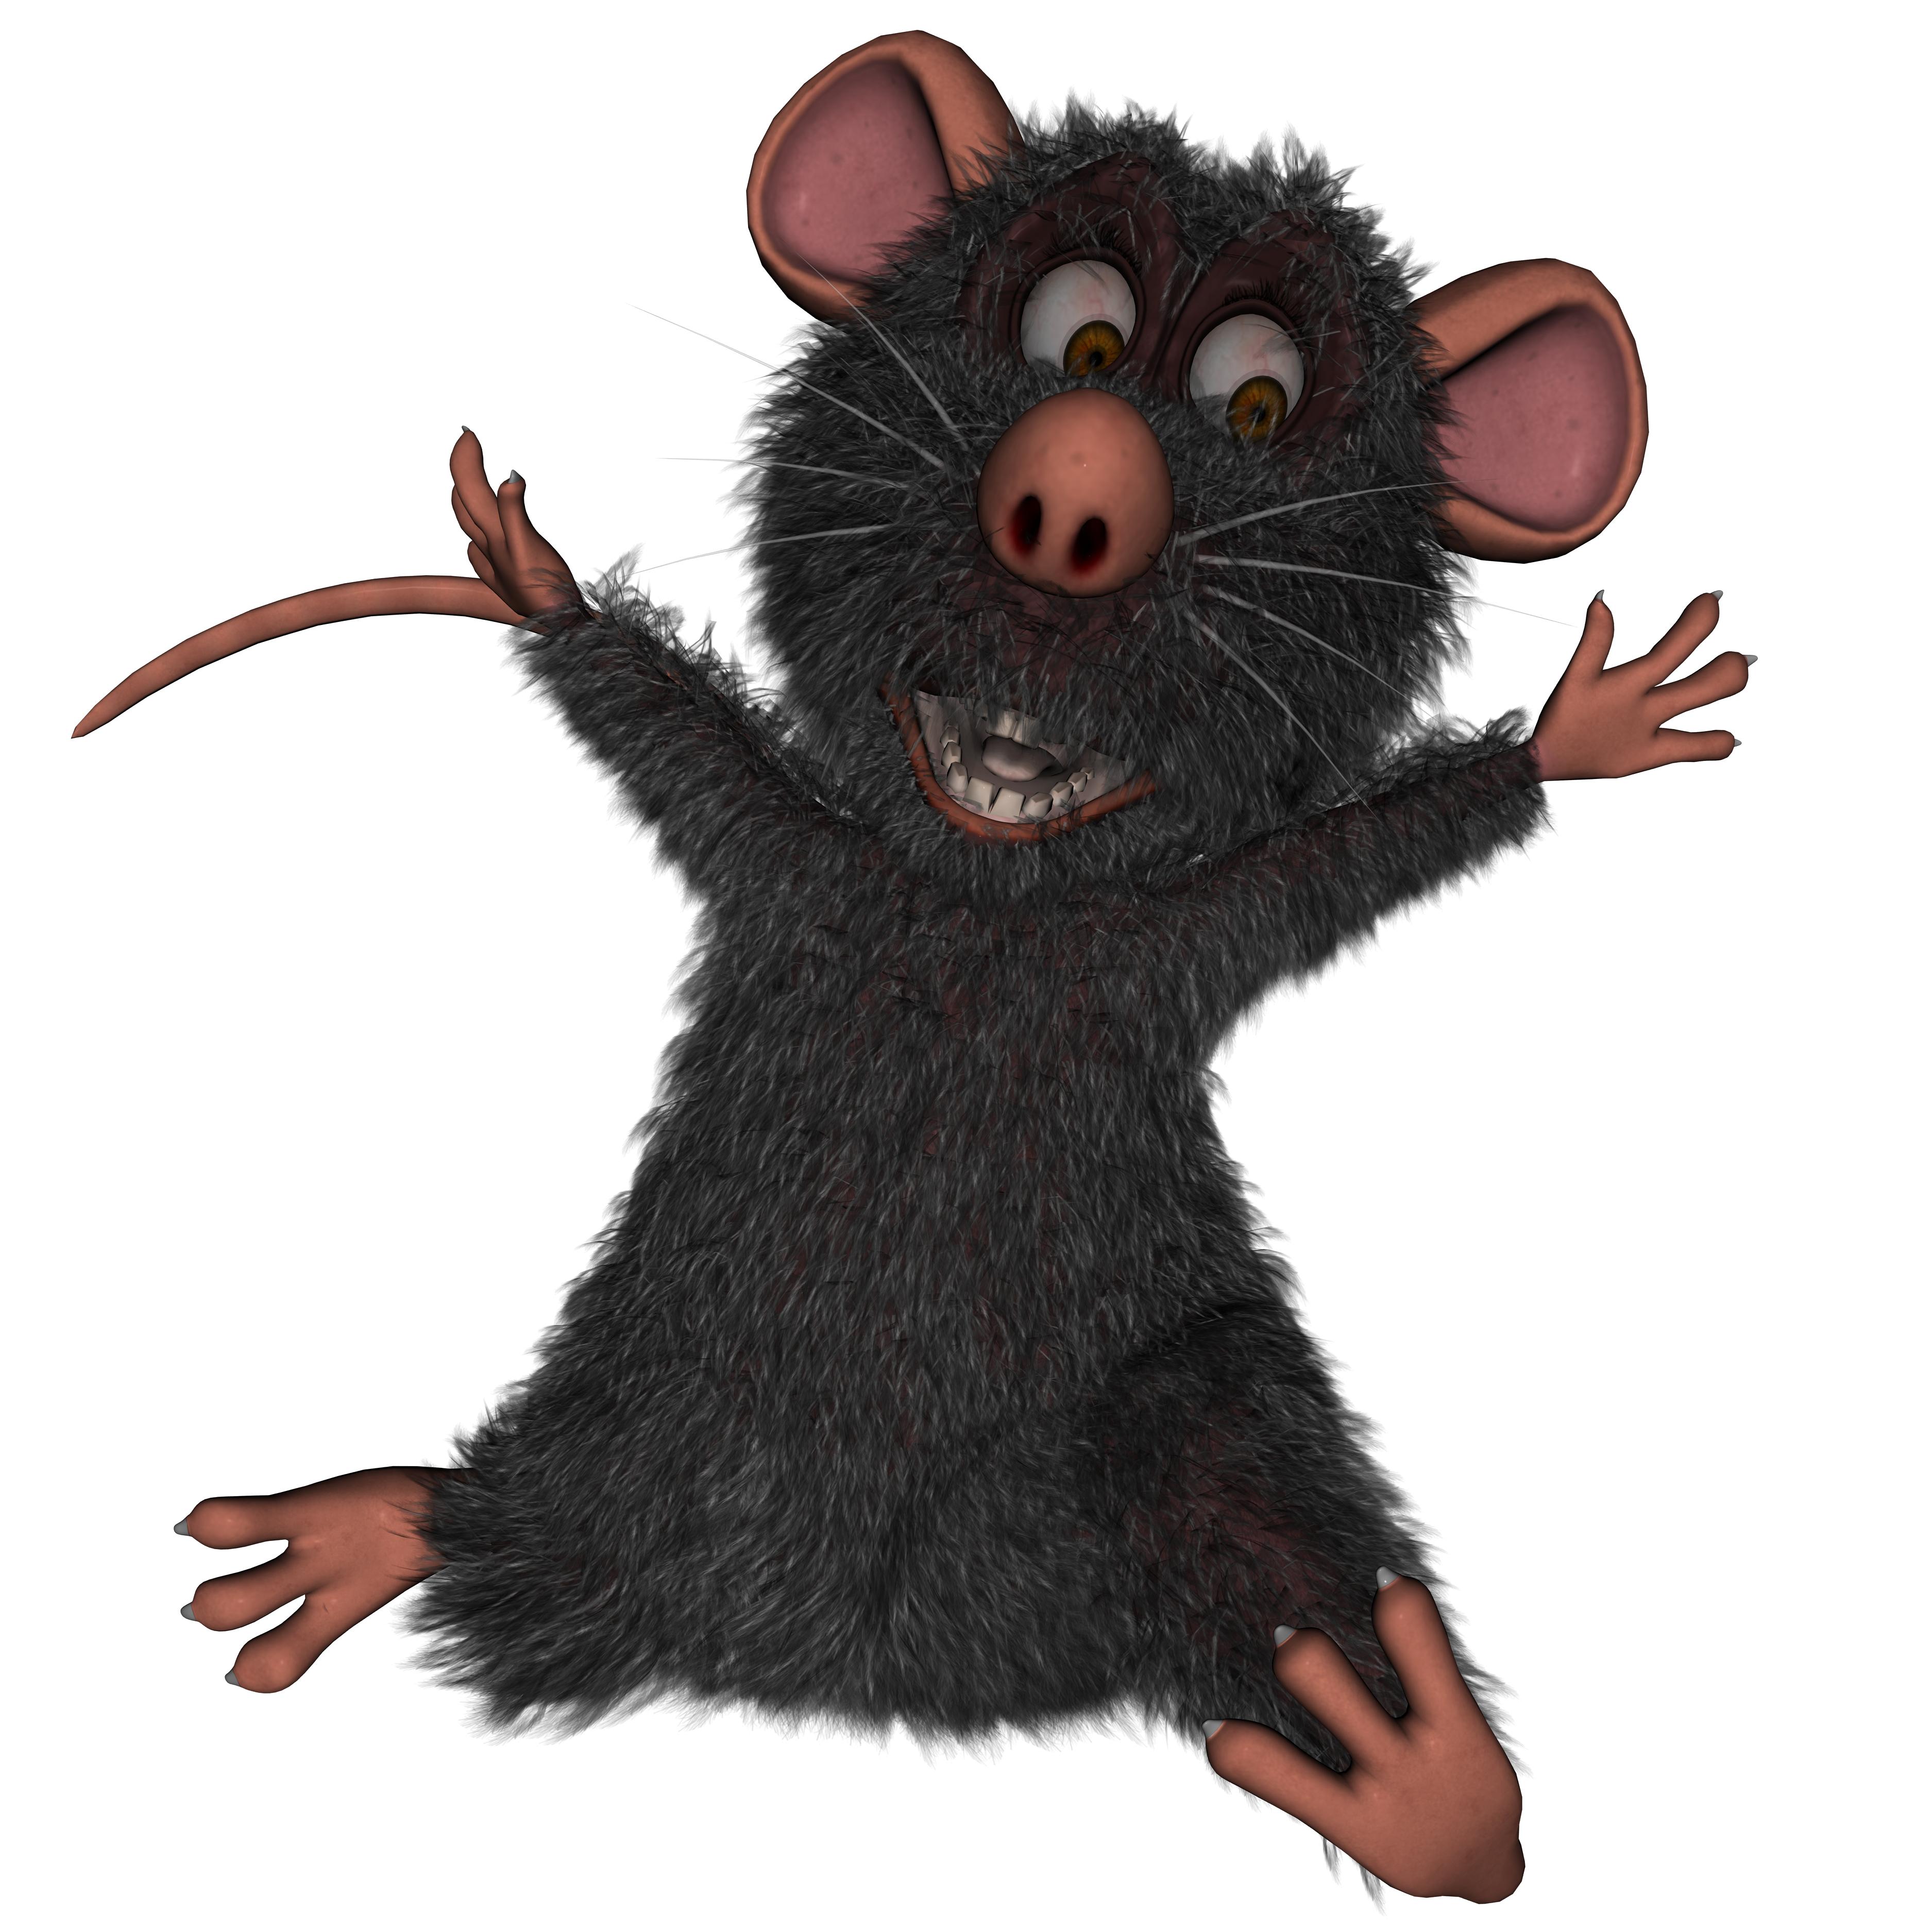 Rat, 3d, Cartoon, Character, Cute, HQ Photo